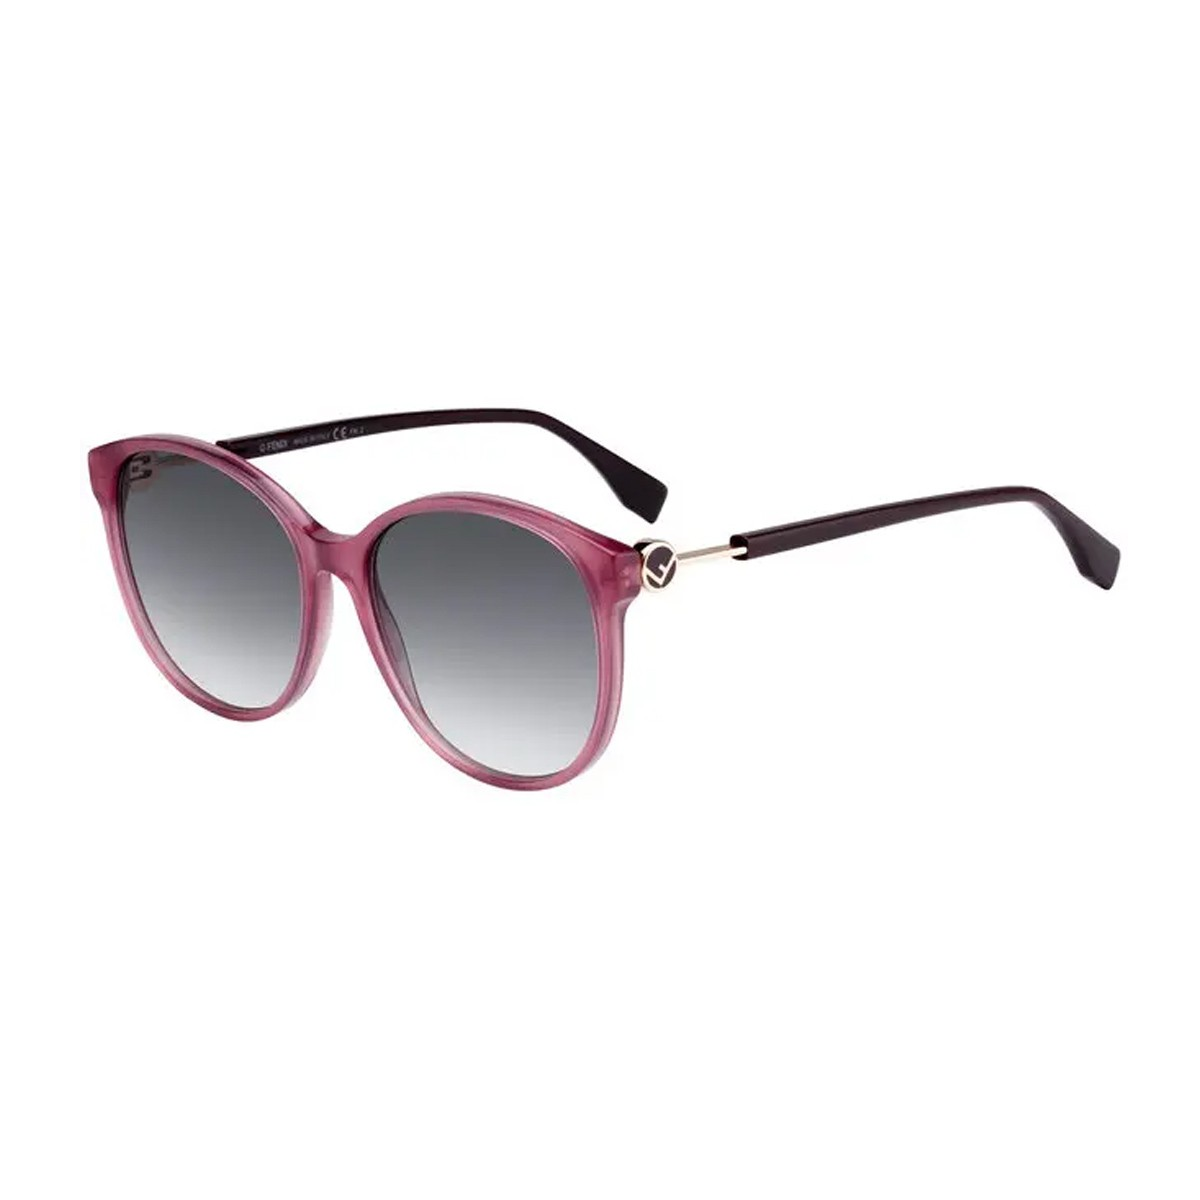 Fendi FF 0412/s   Women's sunglasses